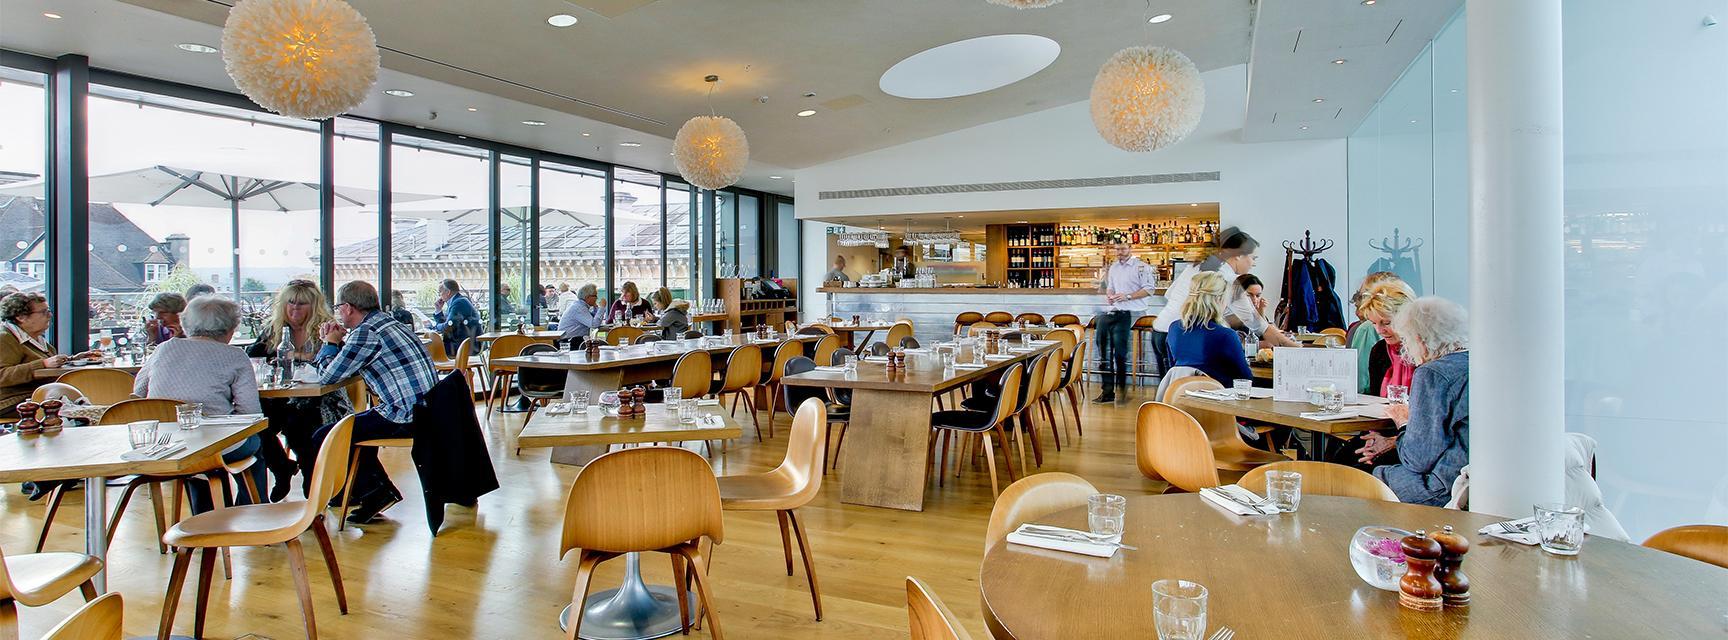 The Ashmolean Rooftop Restaurant